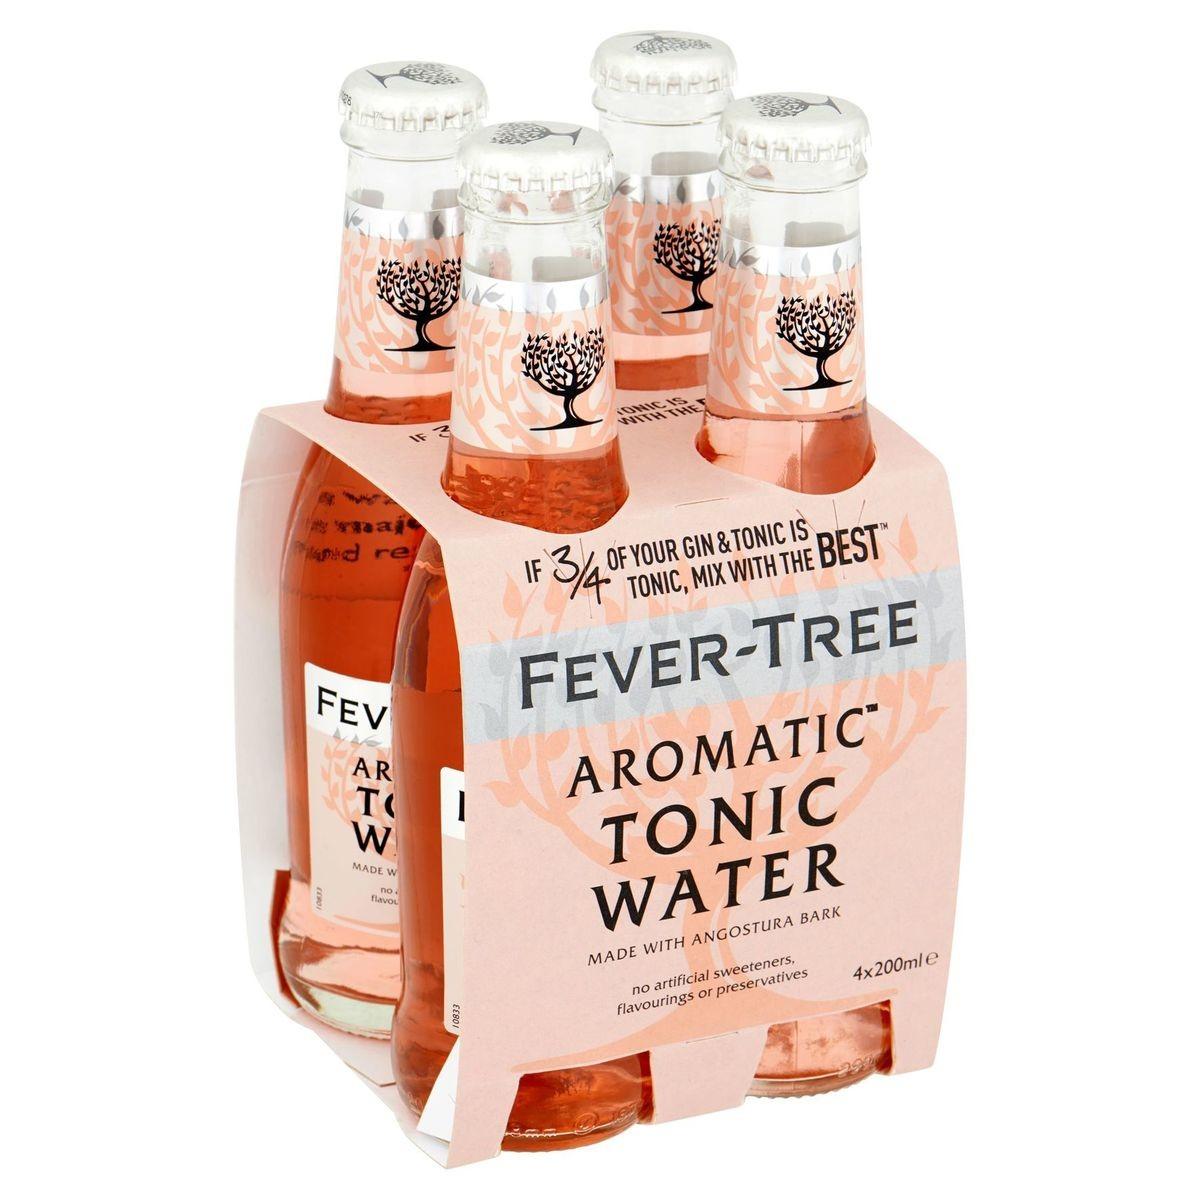 Fever-Tree Aromatic Tonic...